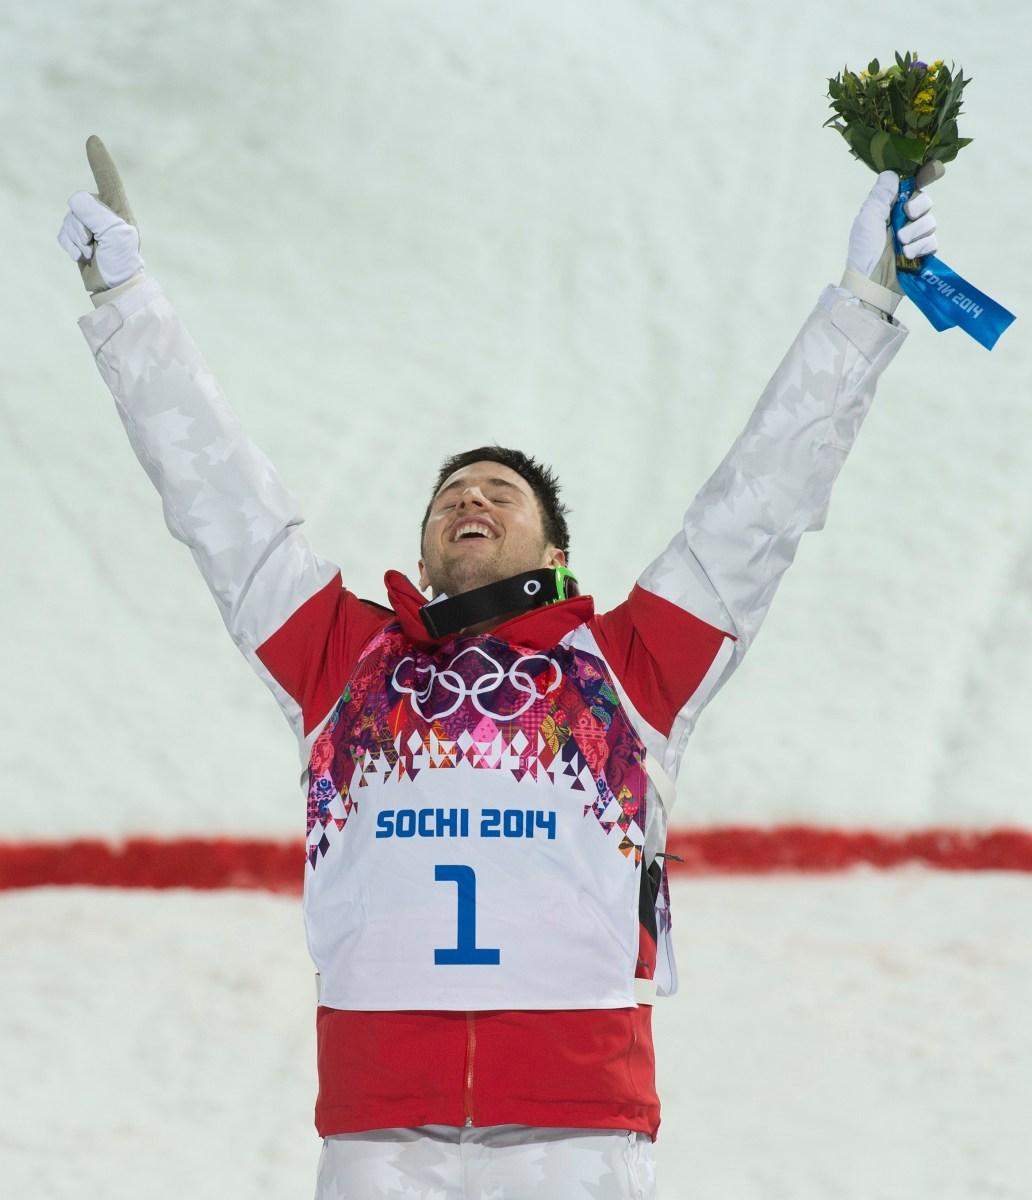 Bilodeau on the podium